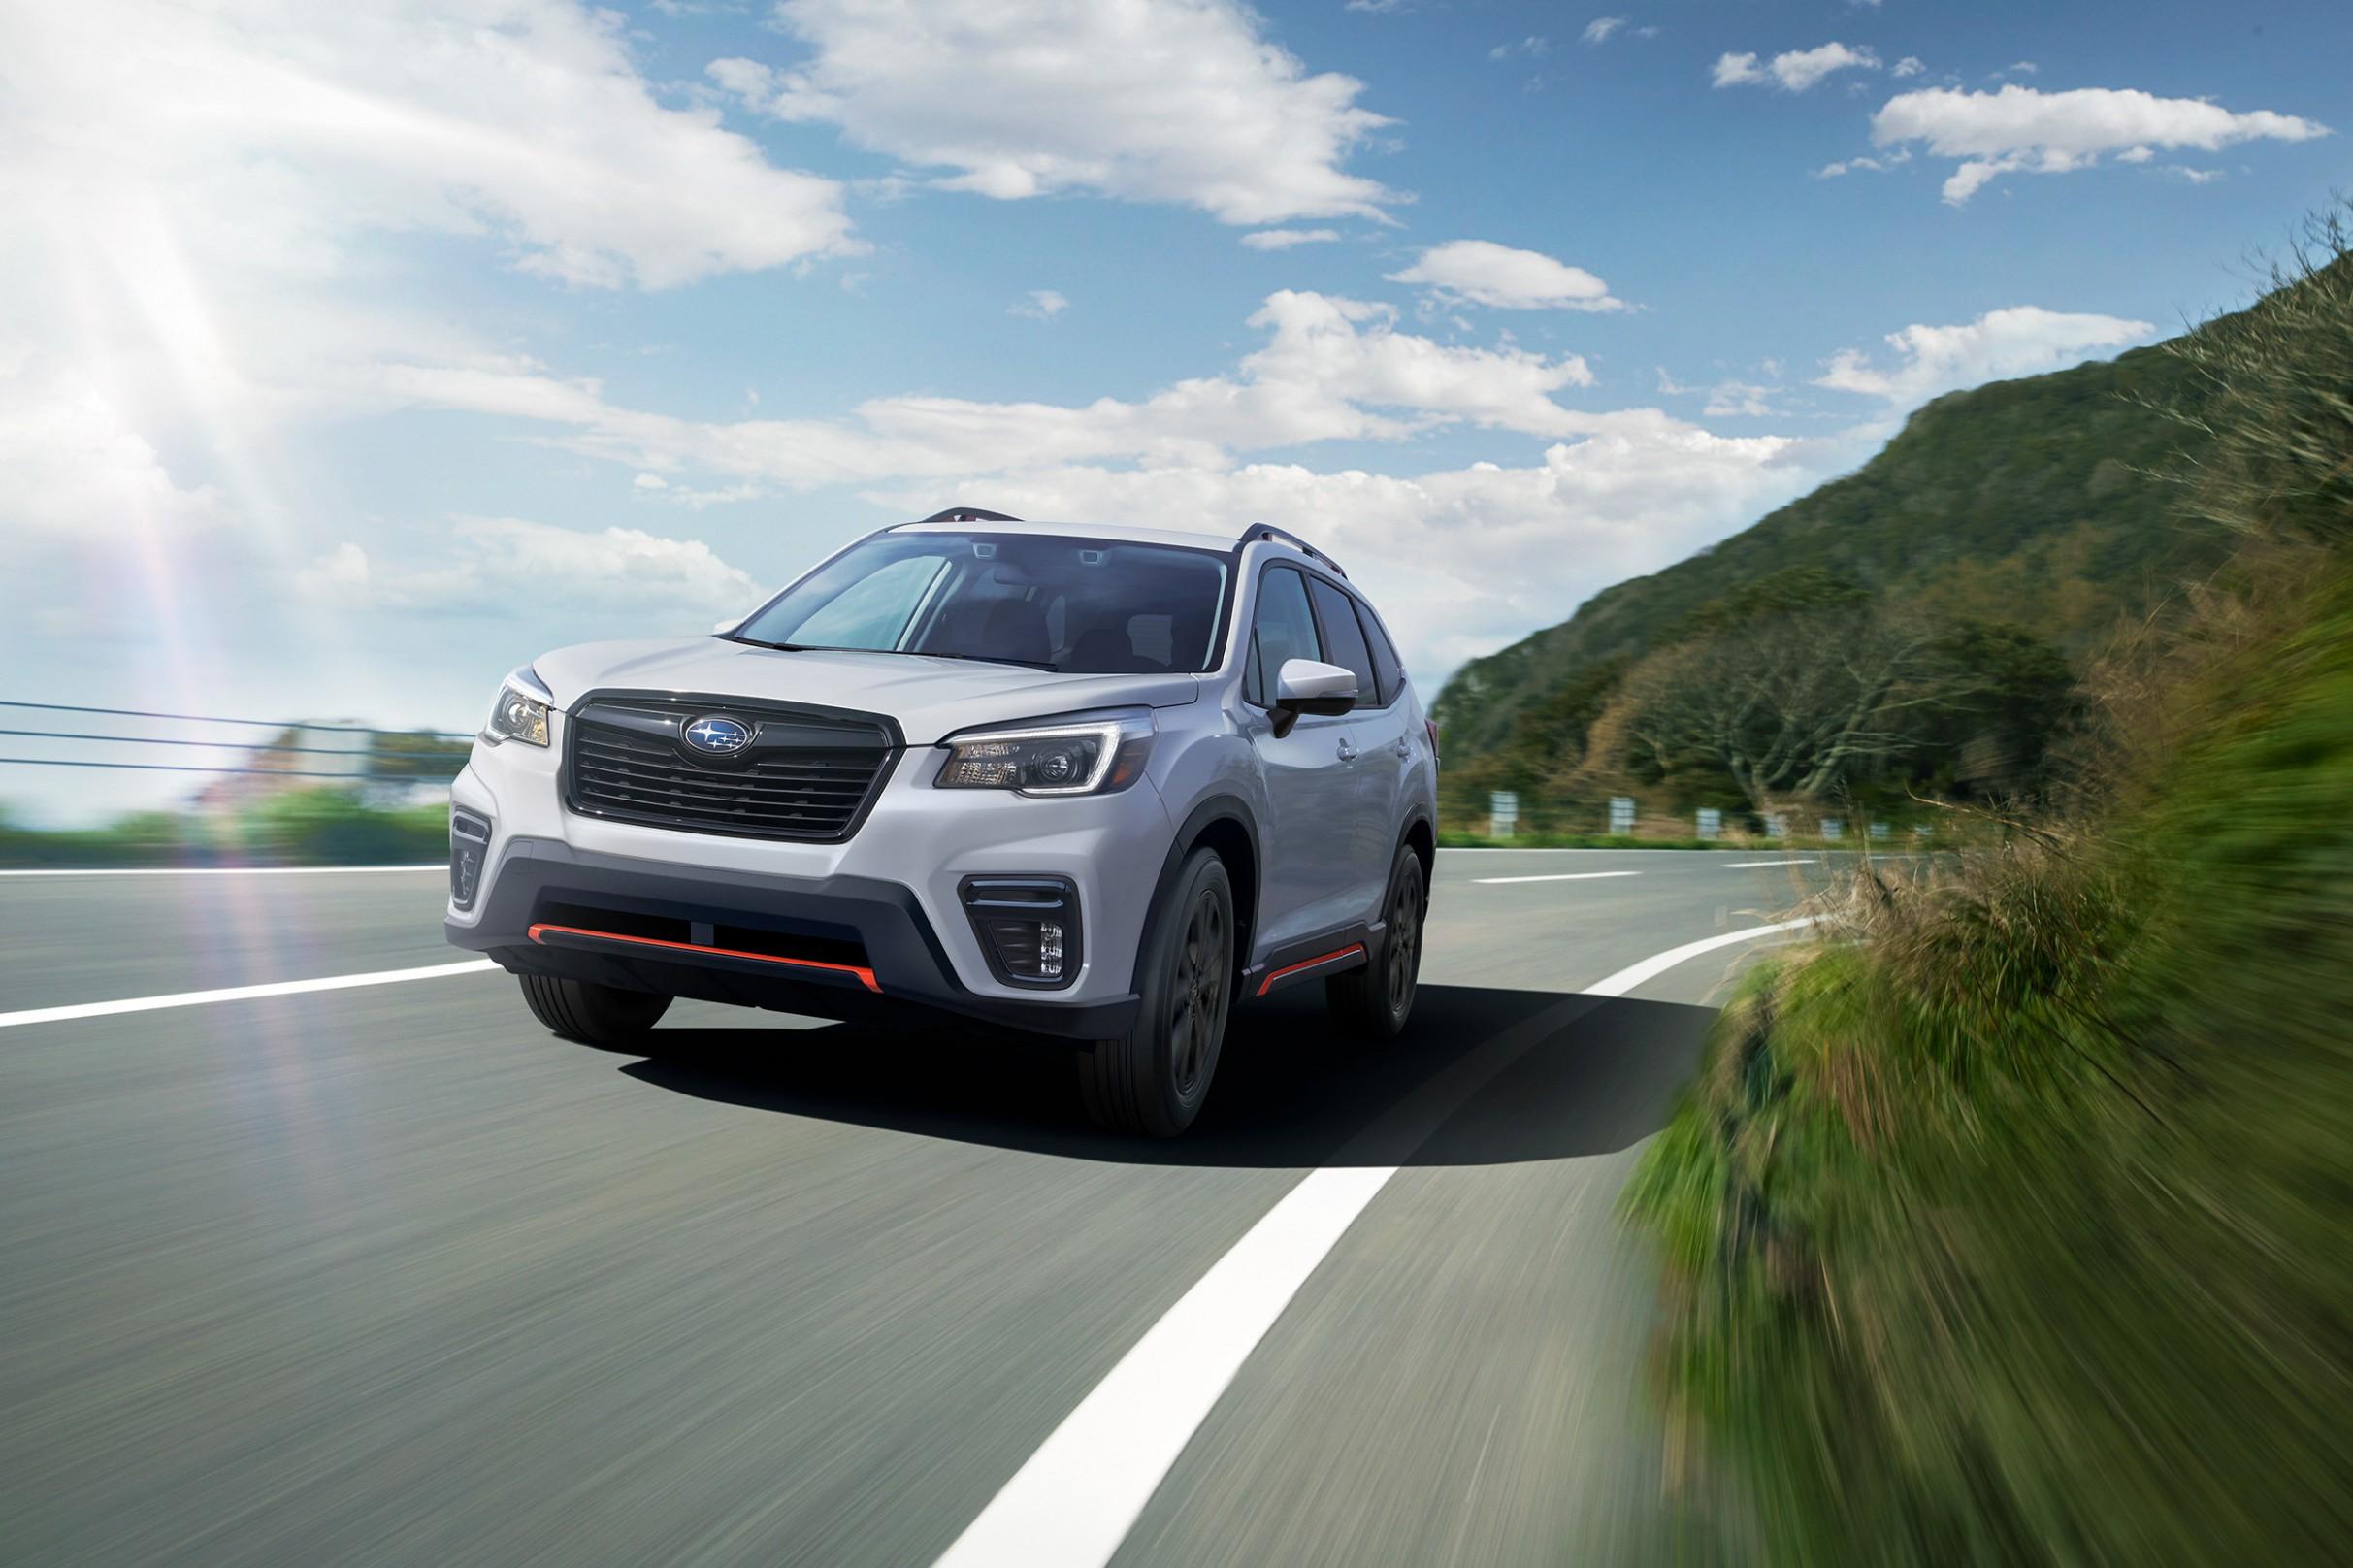 Subaru Canada Announces 5 Forester Pricing - Subaru Canada 2021